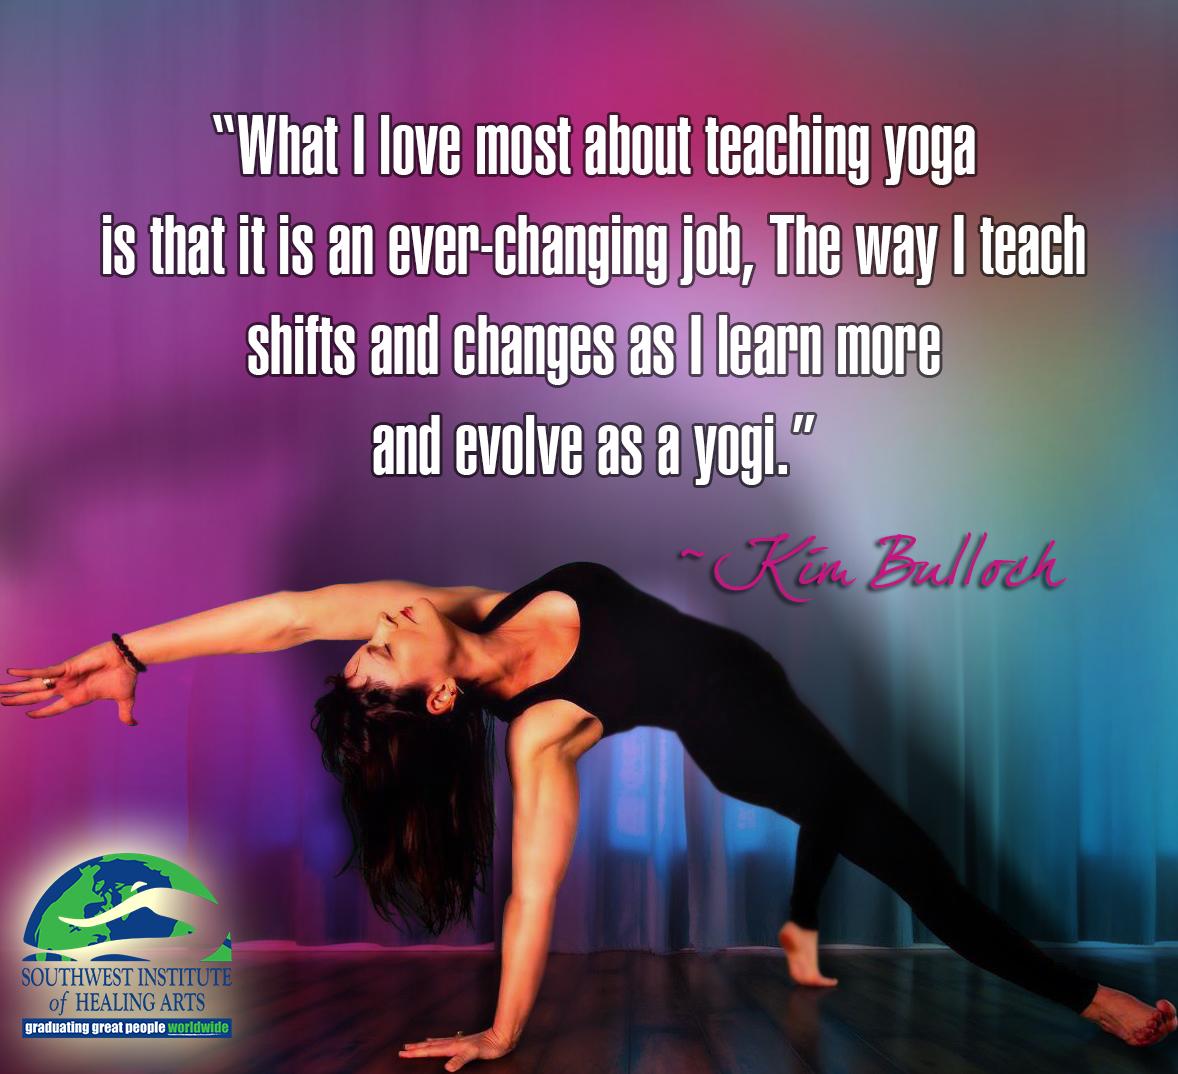 Benefits of Yoga - Southwest Institute of Healing Arts - Kim Bulloch